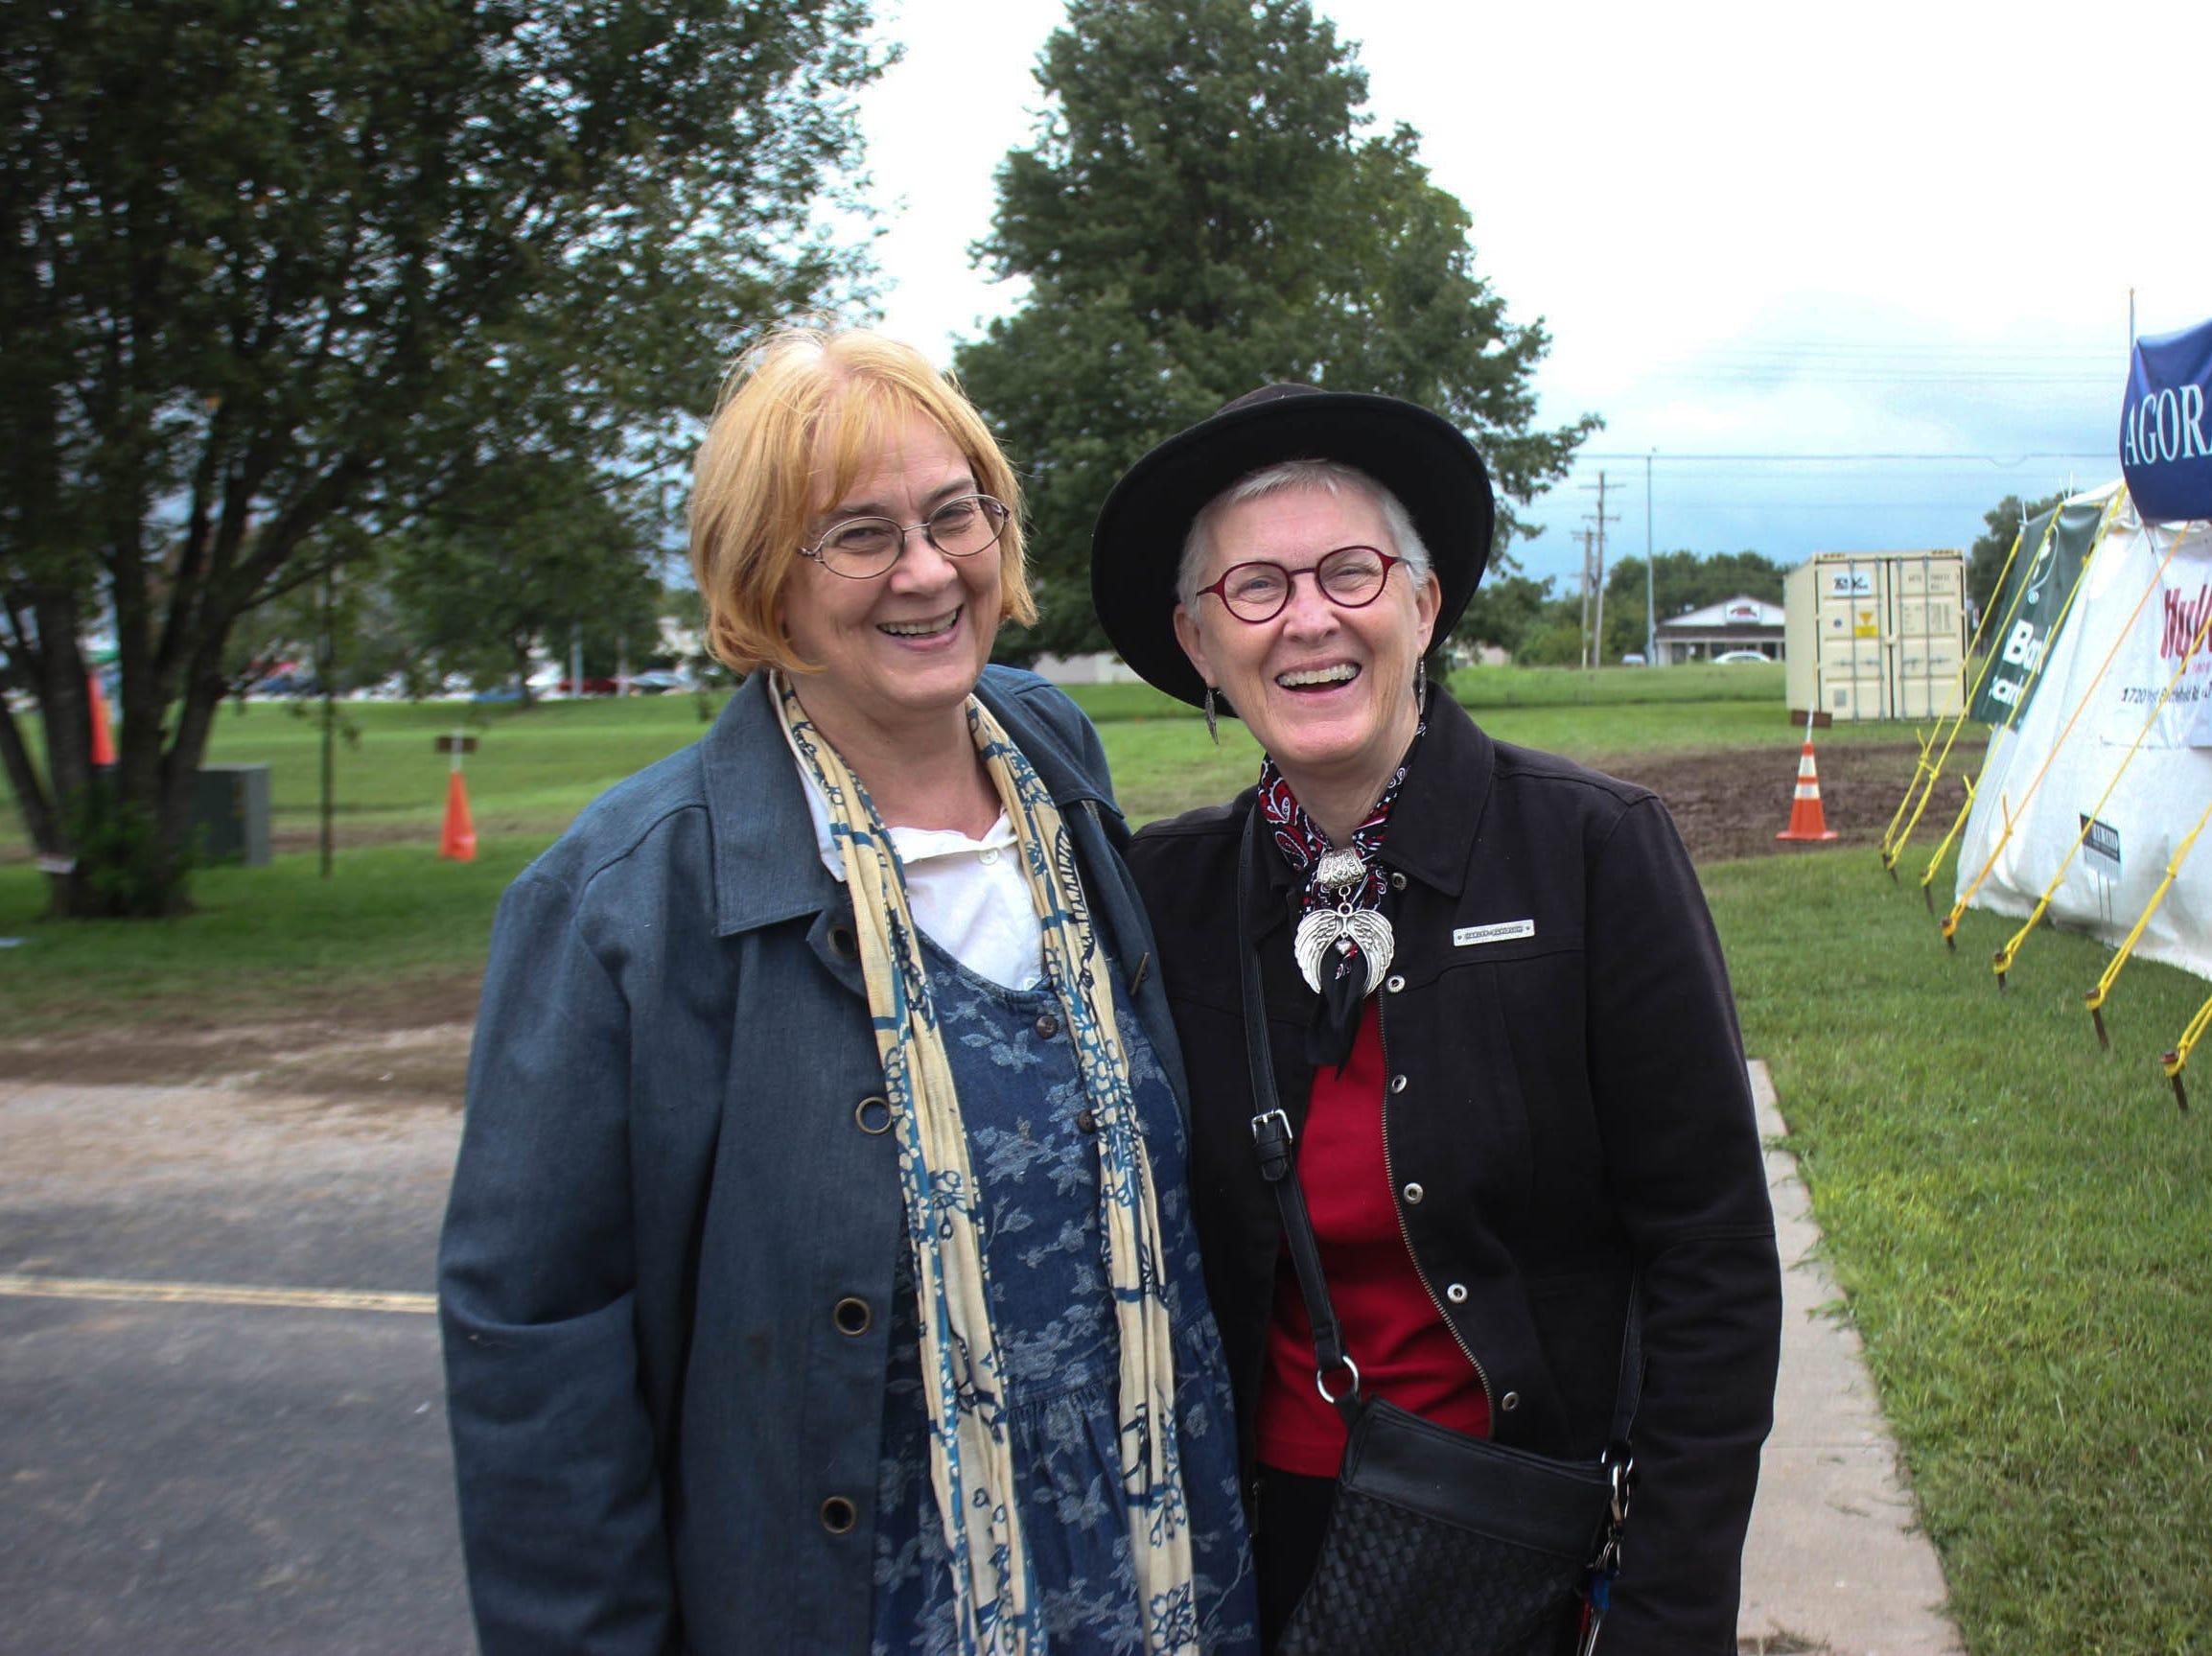 Cynthia Moore and Stephanie Smock